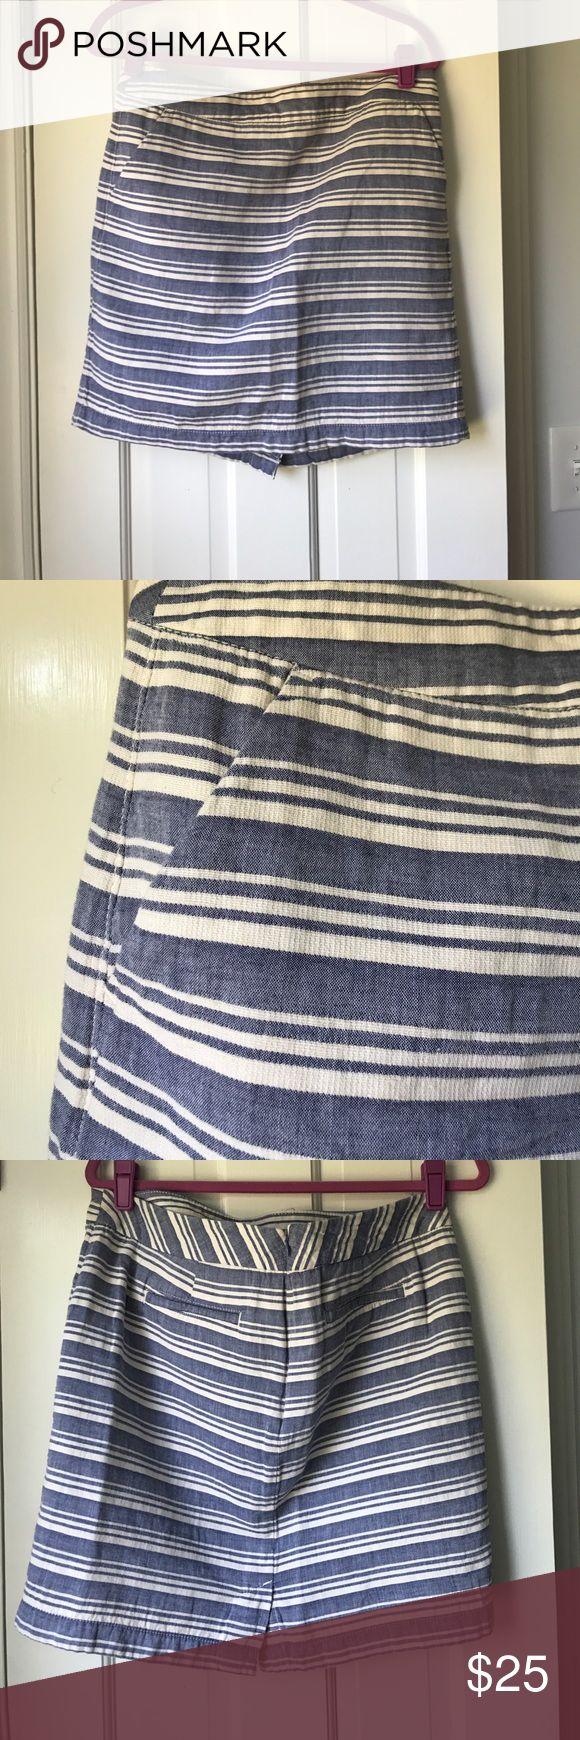 Stripped skirt Blend of cotton and linen. Side front pocket and back Ali pockets, natural waist, never worn. Tommy Hilfiger Skirts Pencil